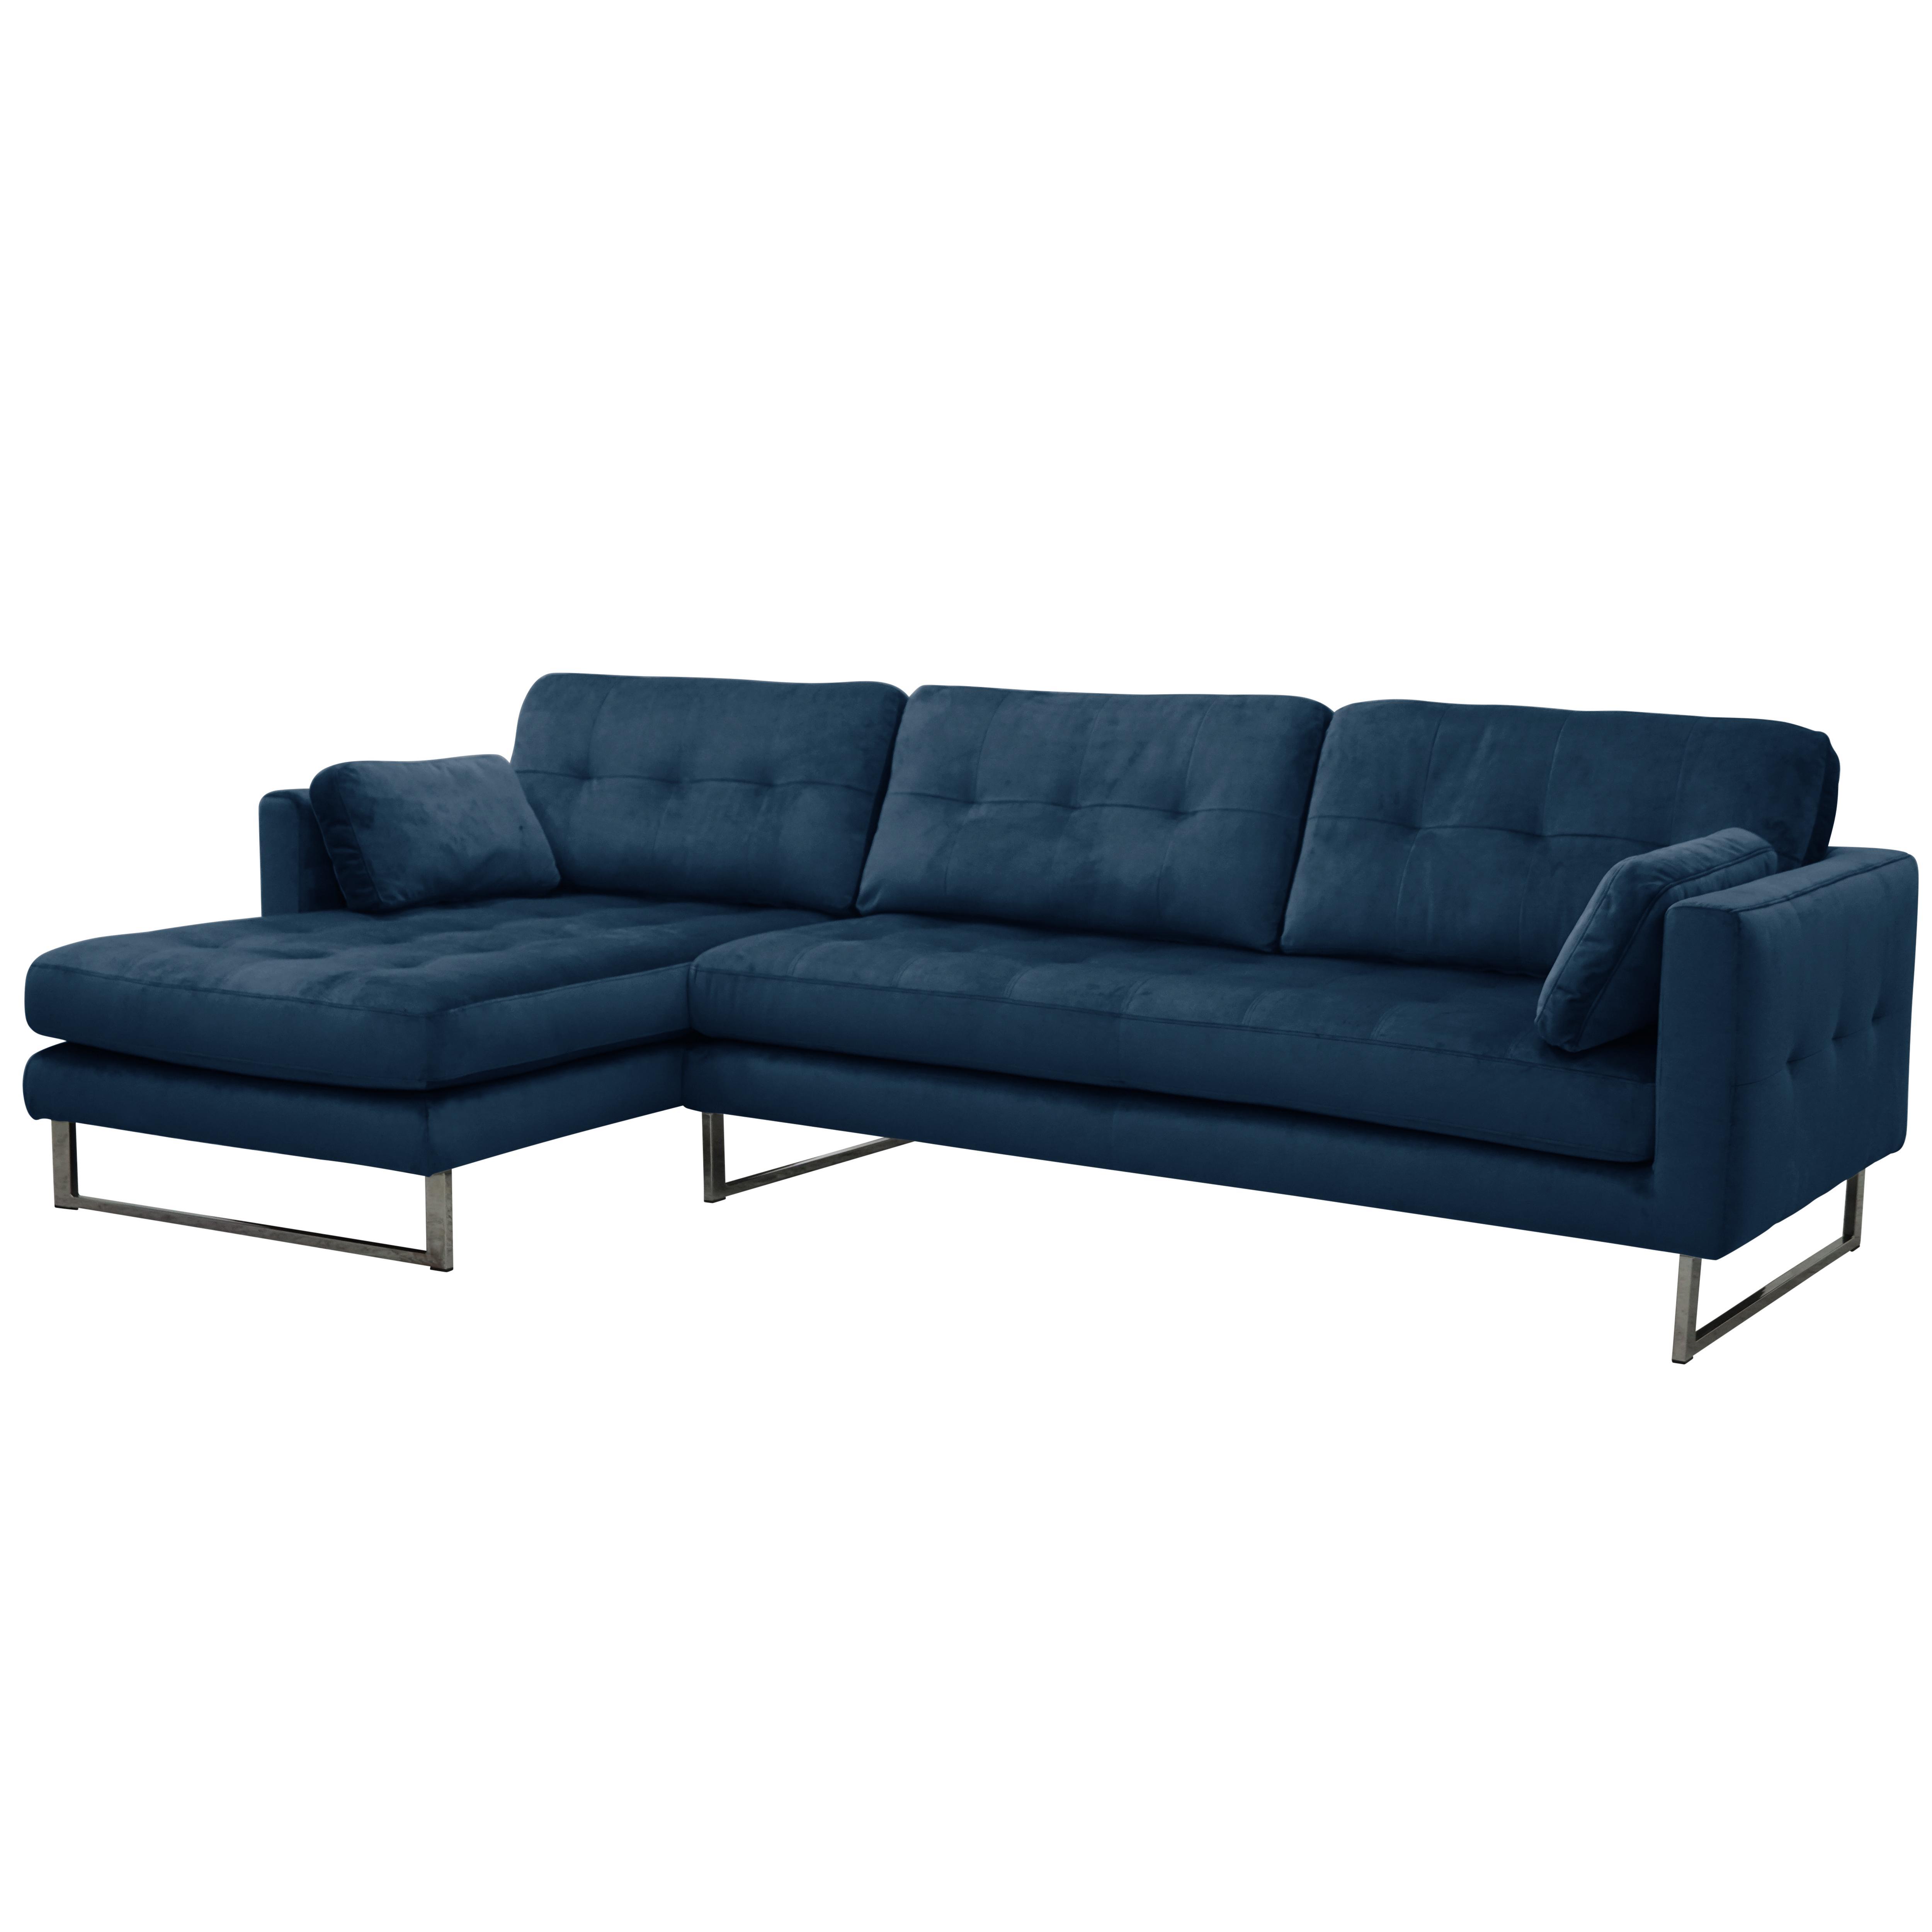 Paris II left hand facing four seater chaise sofa alba velvet blue